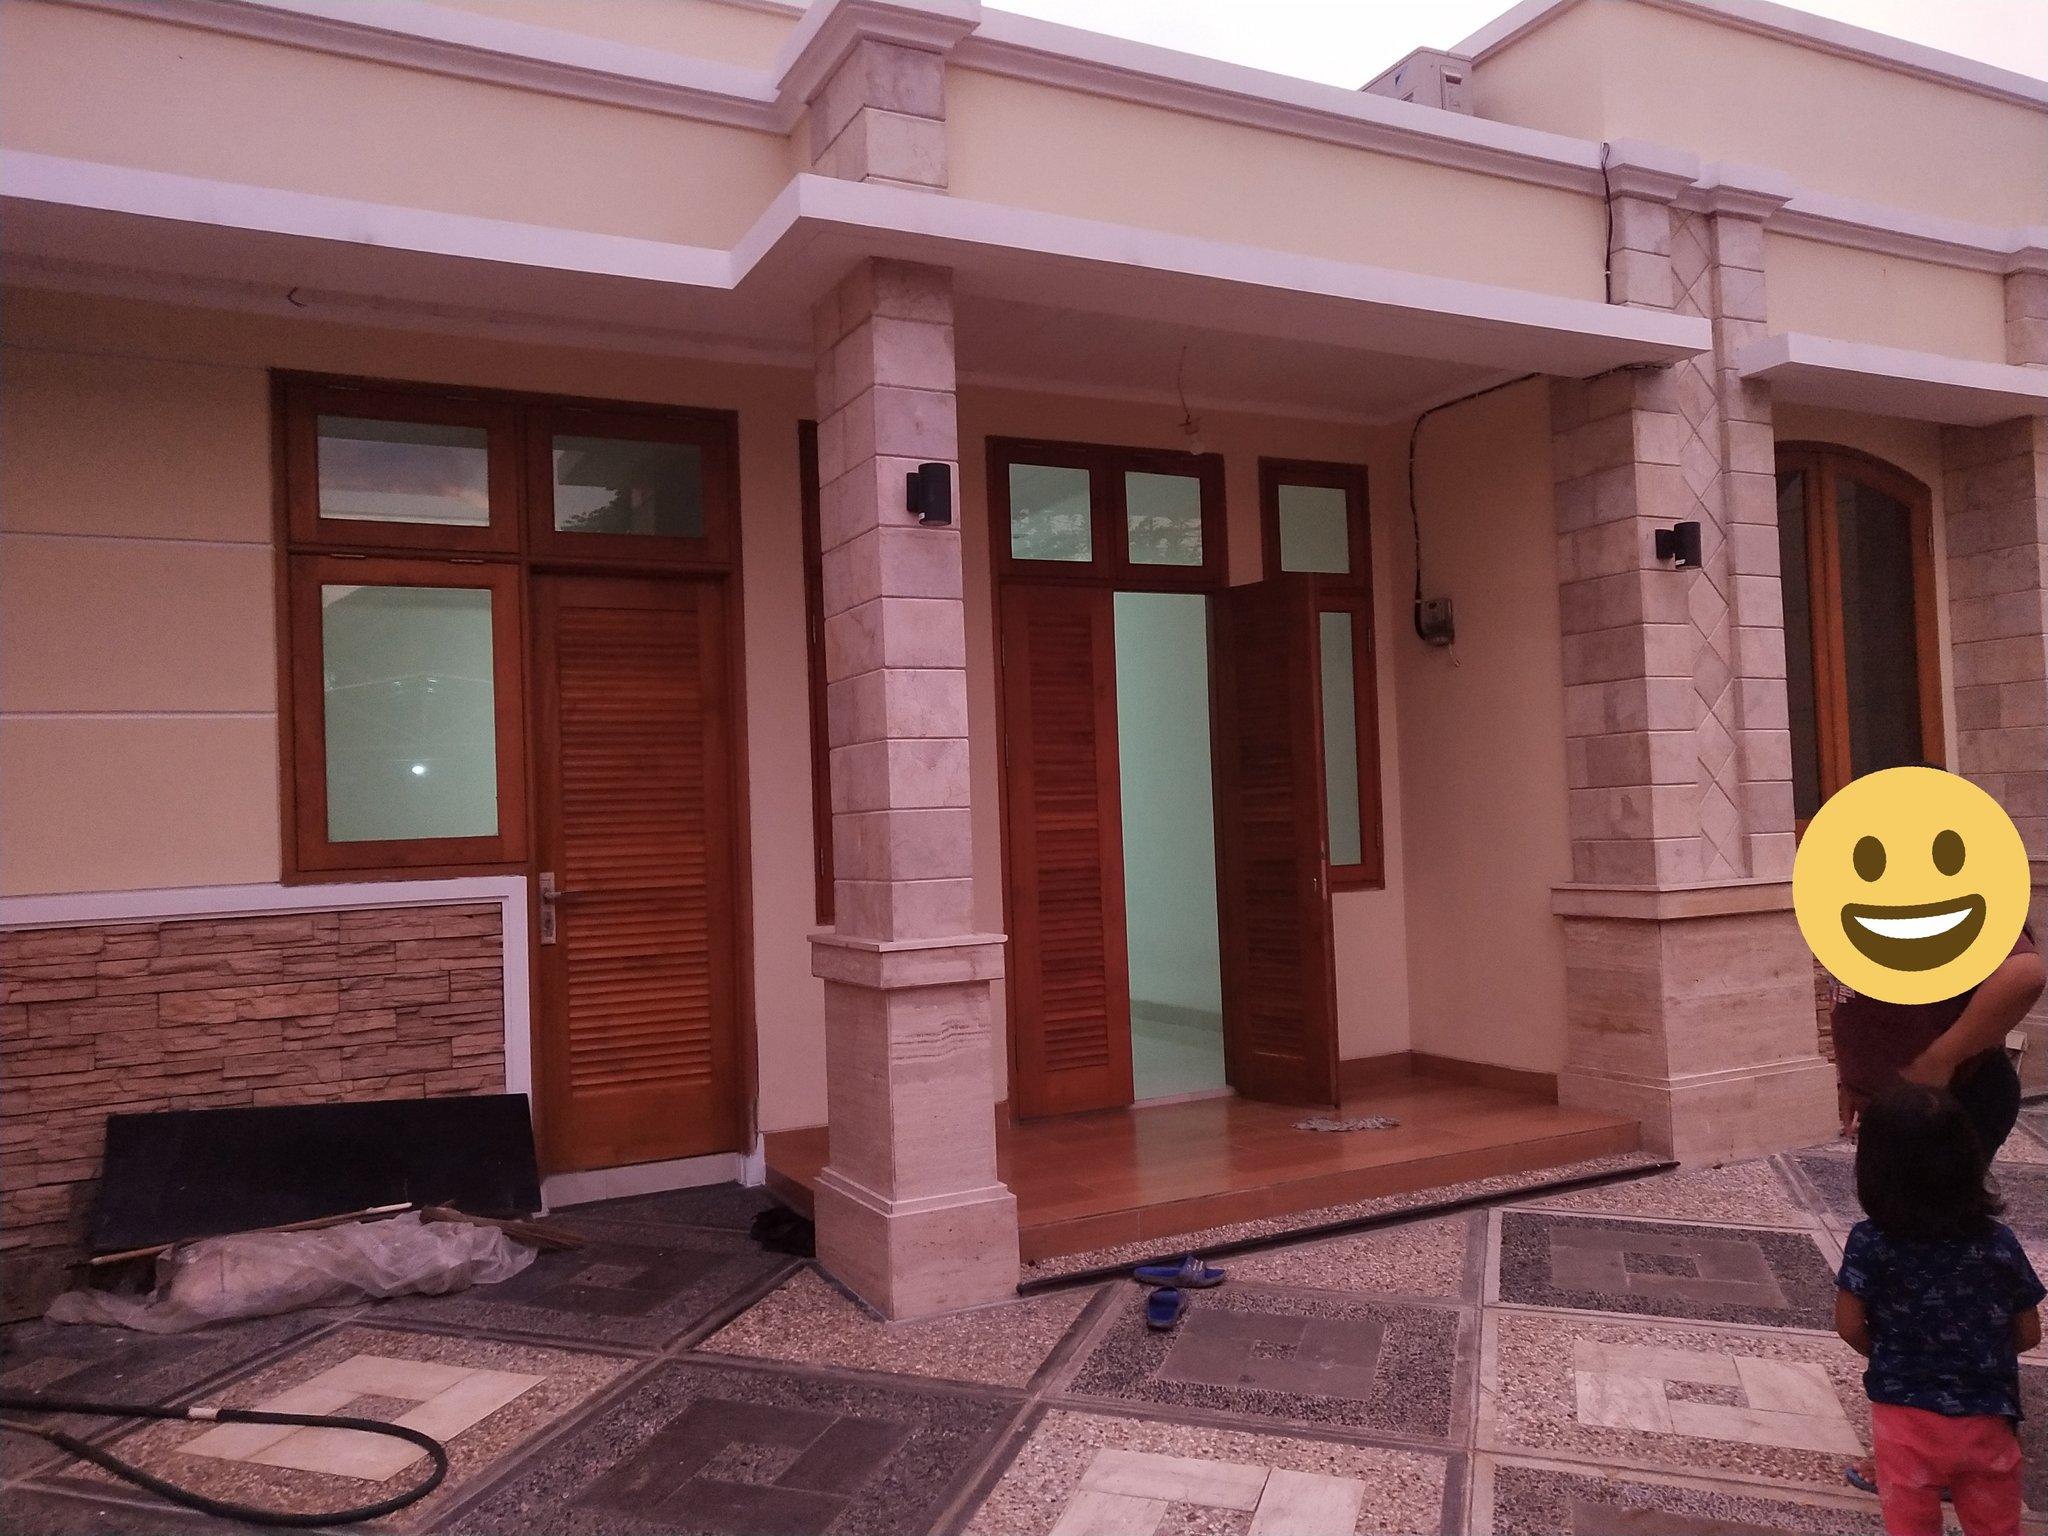 Penampakan rumah baru Dwi Anggreani, istri yang ditinggal wafat suami ketika rumah baru selesai dibangun.